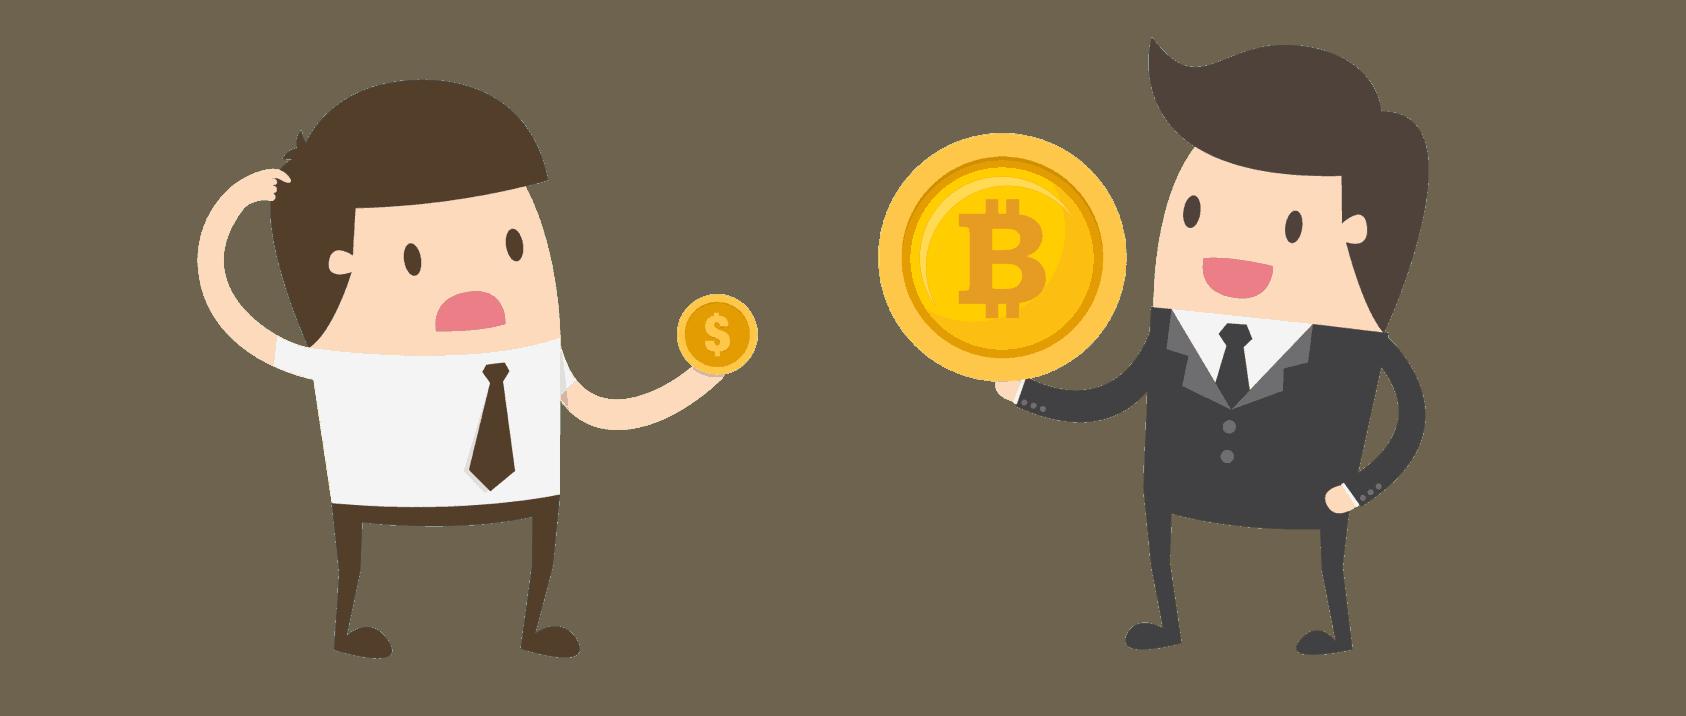 bitcoin mynt vs dollar